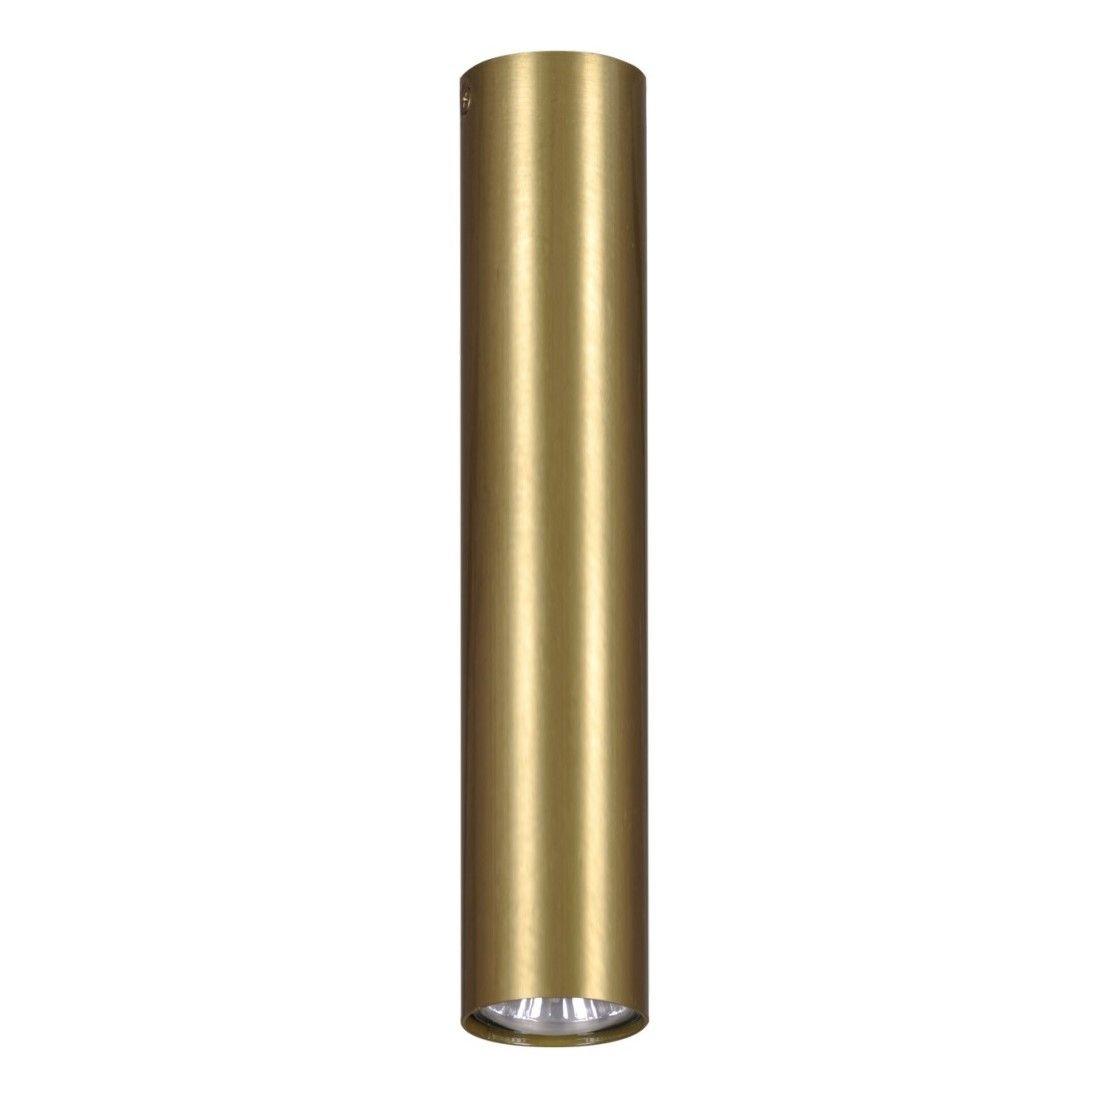 Złota lampa sufitowa Berga L - tuba